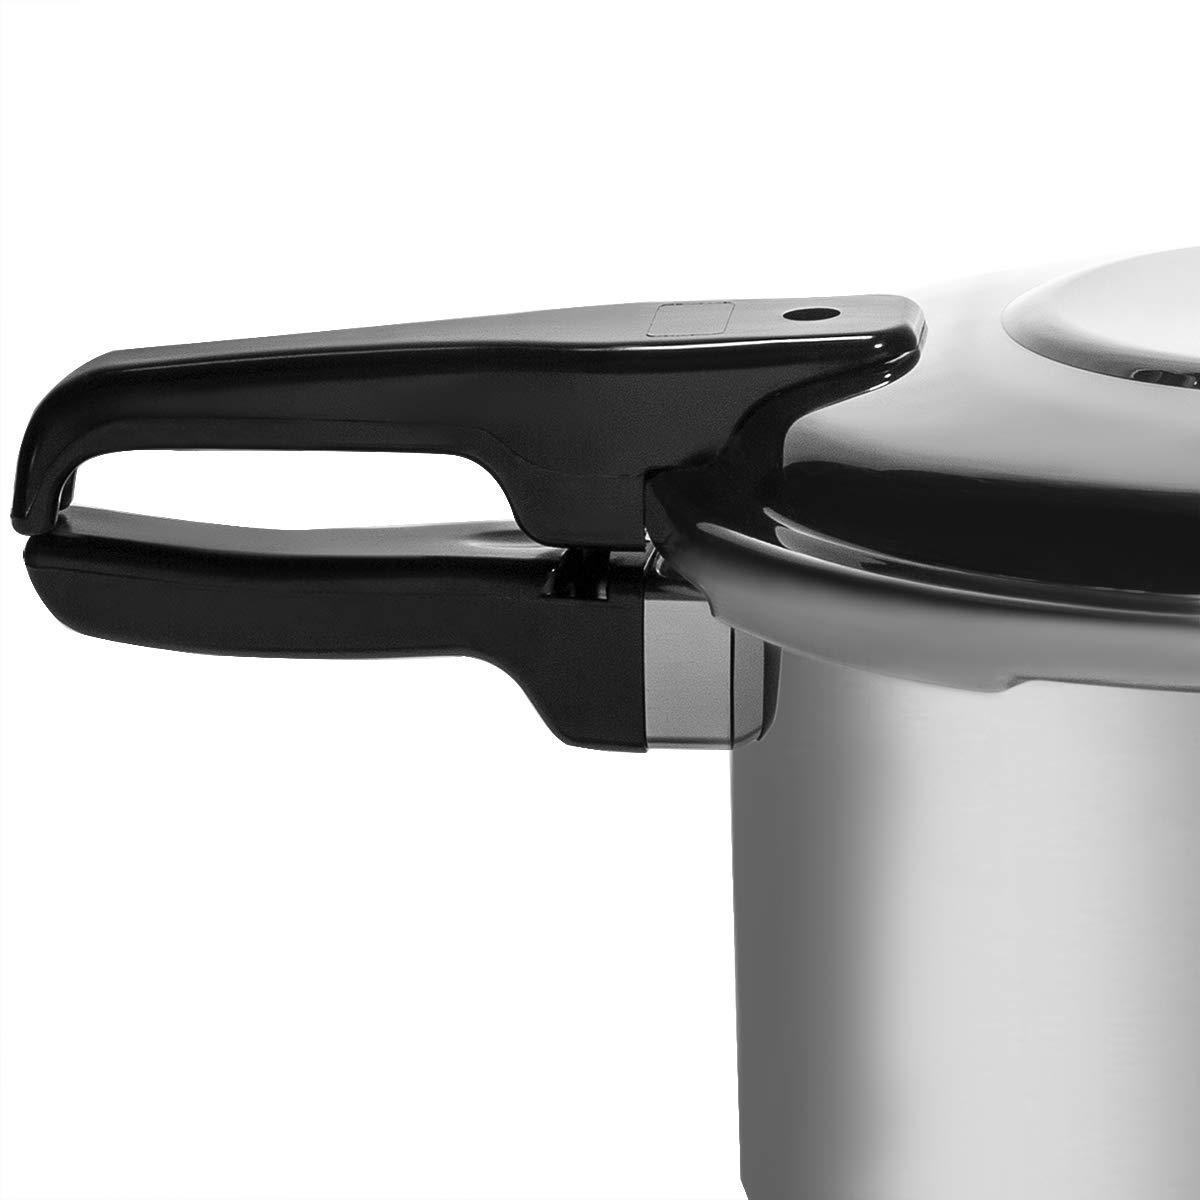 Barton 8-Quart Aluminum Pressure Cooker Stovetop Fast Cooker Pot Pressure Regulator Fast Cooking Steam Release Valve by Barton (Image #3)